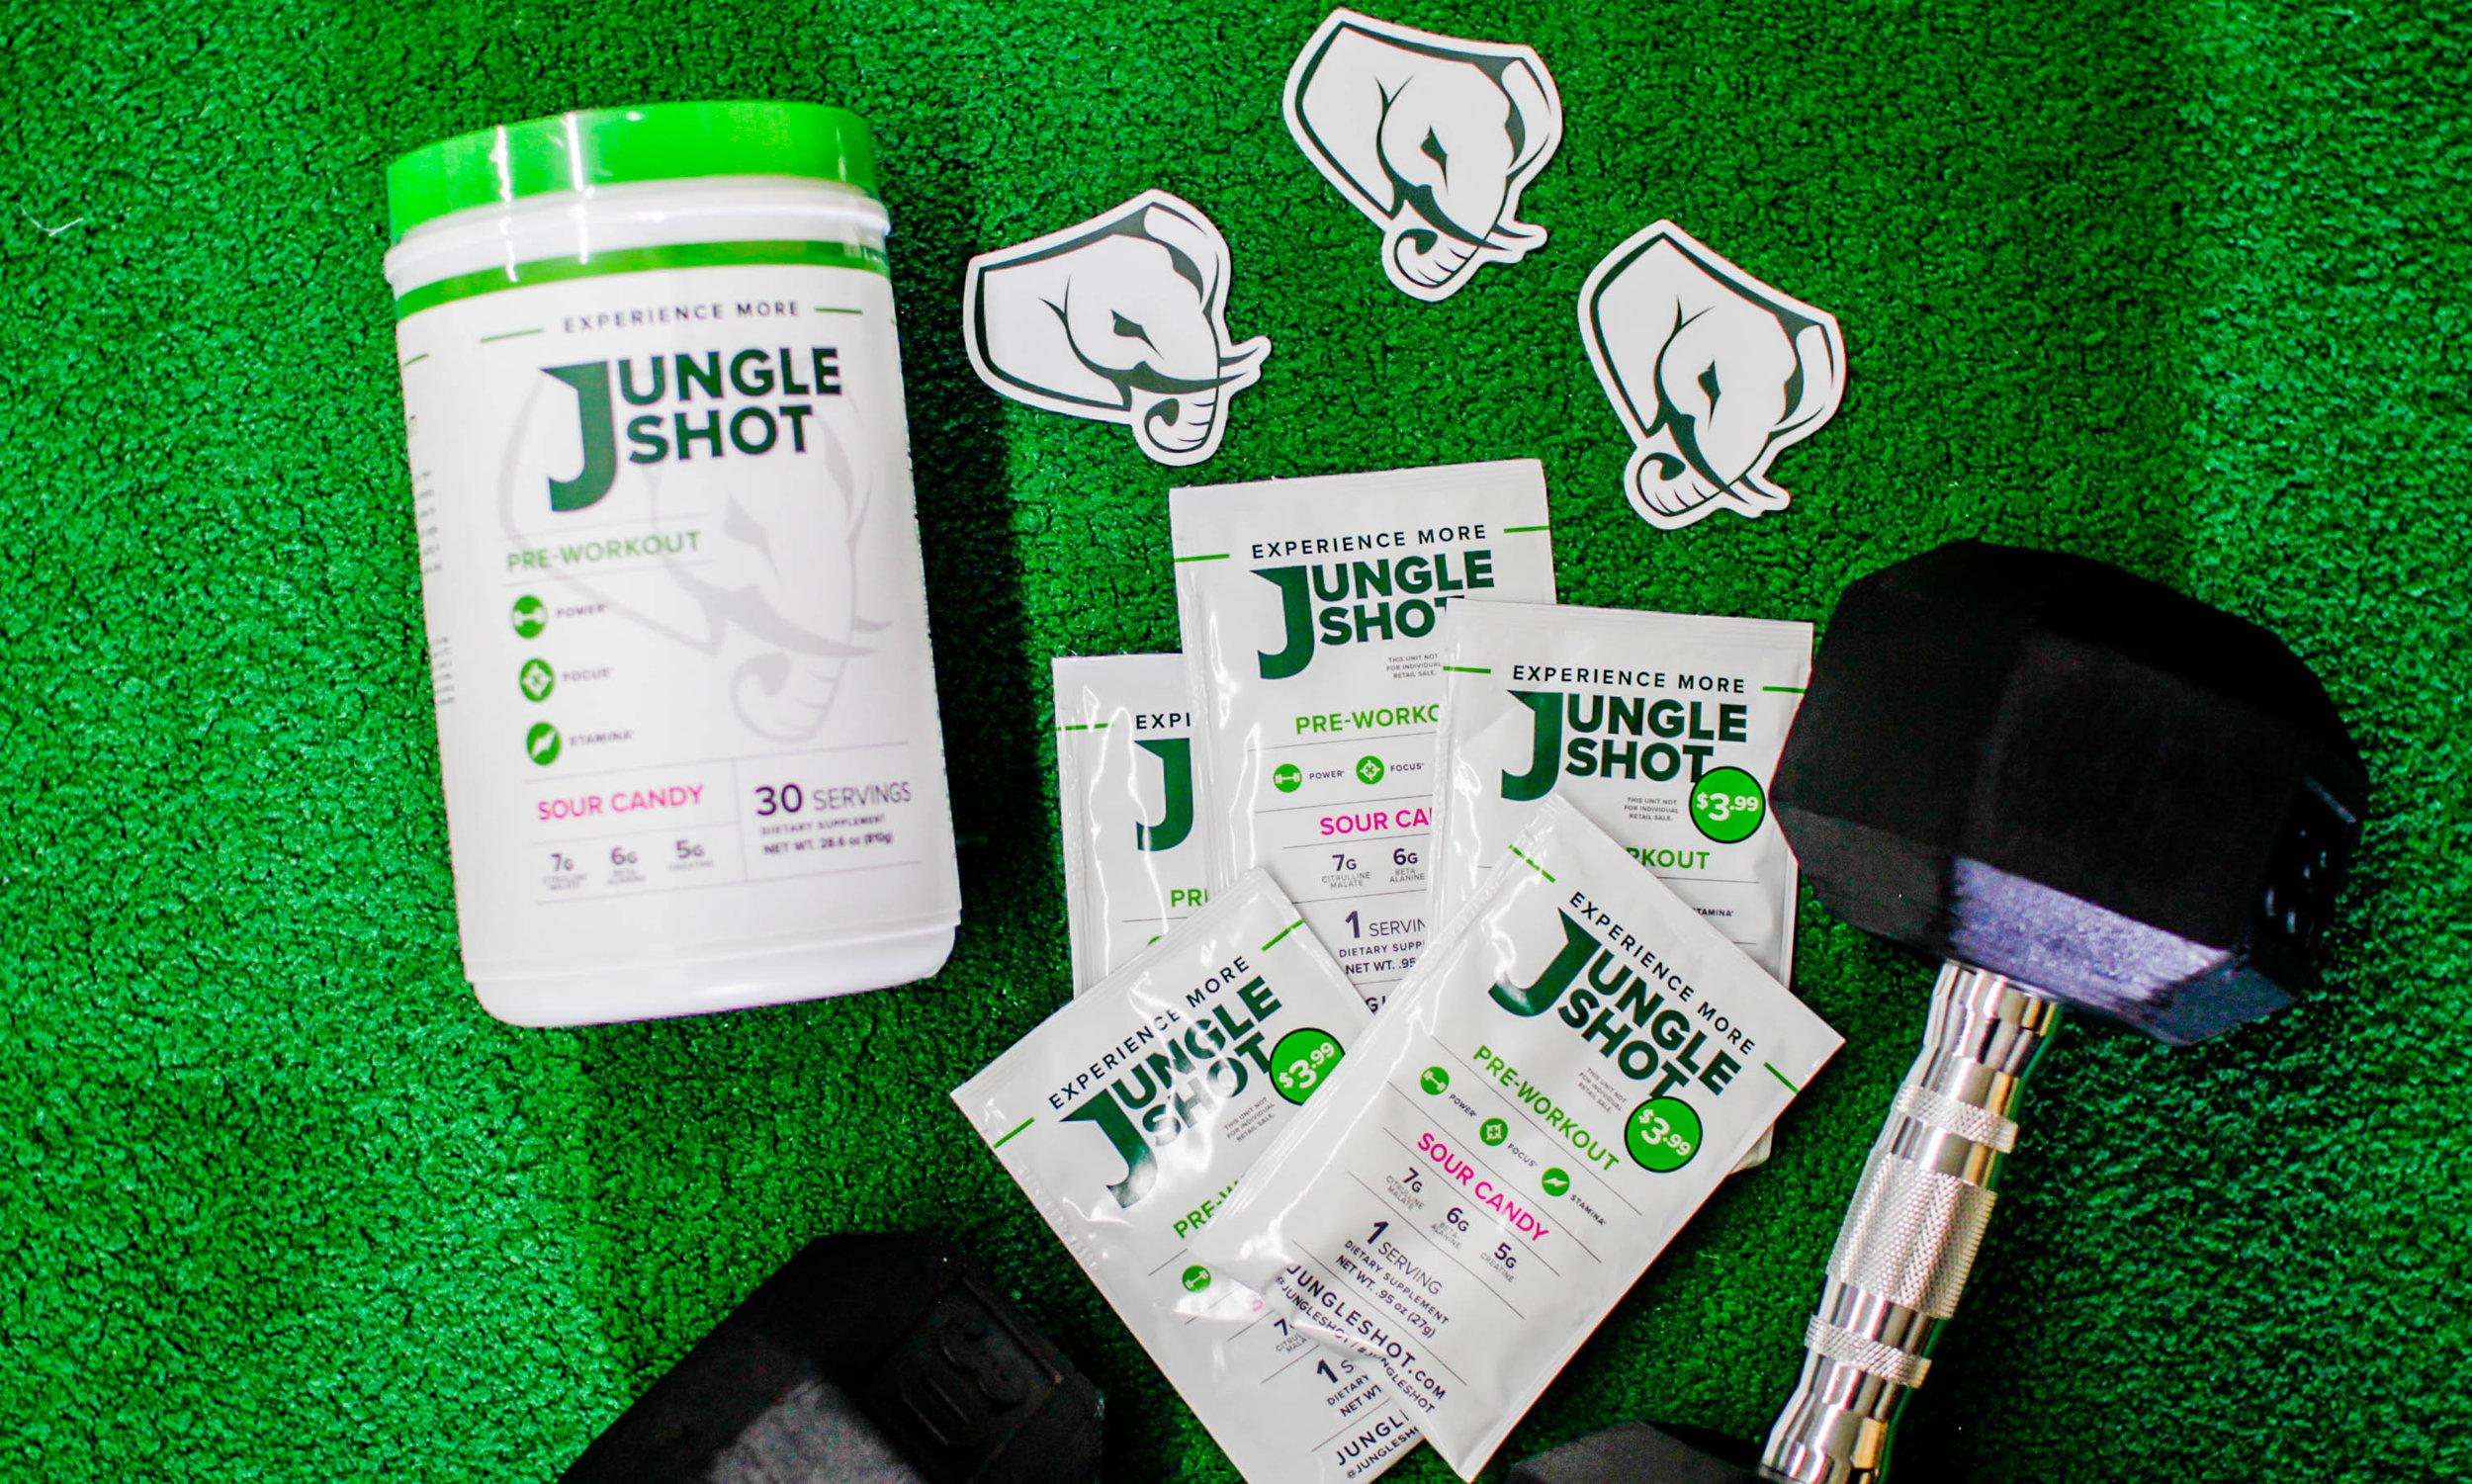 Jungle Shot Pre-Workout